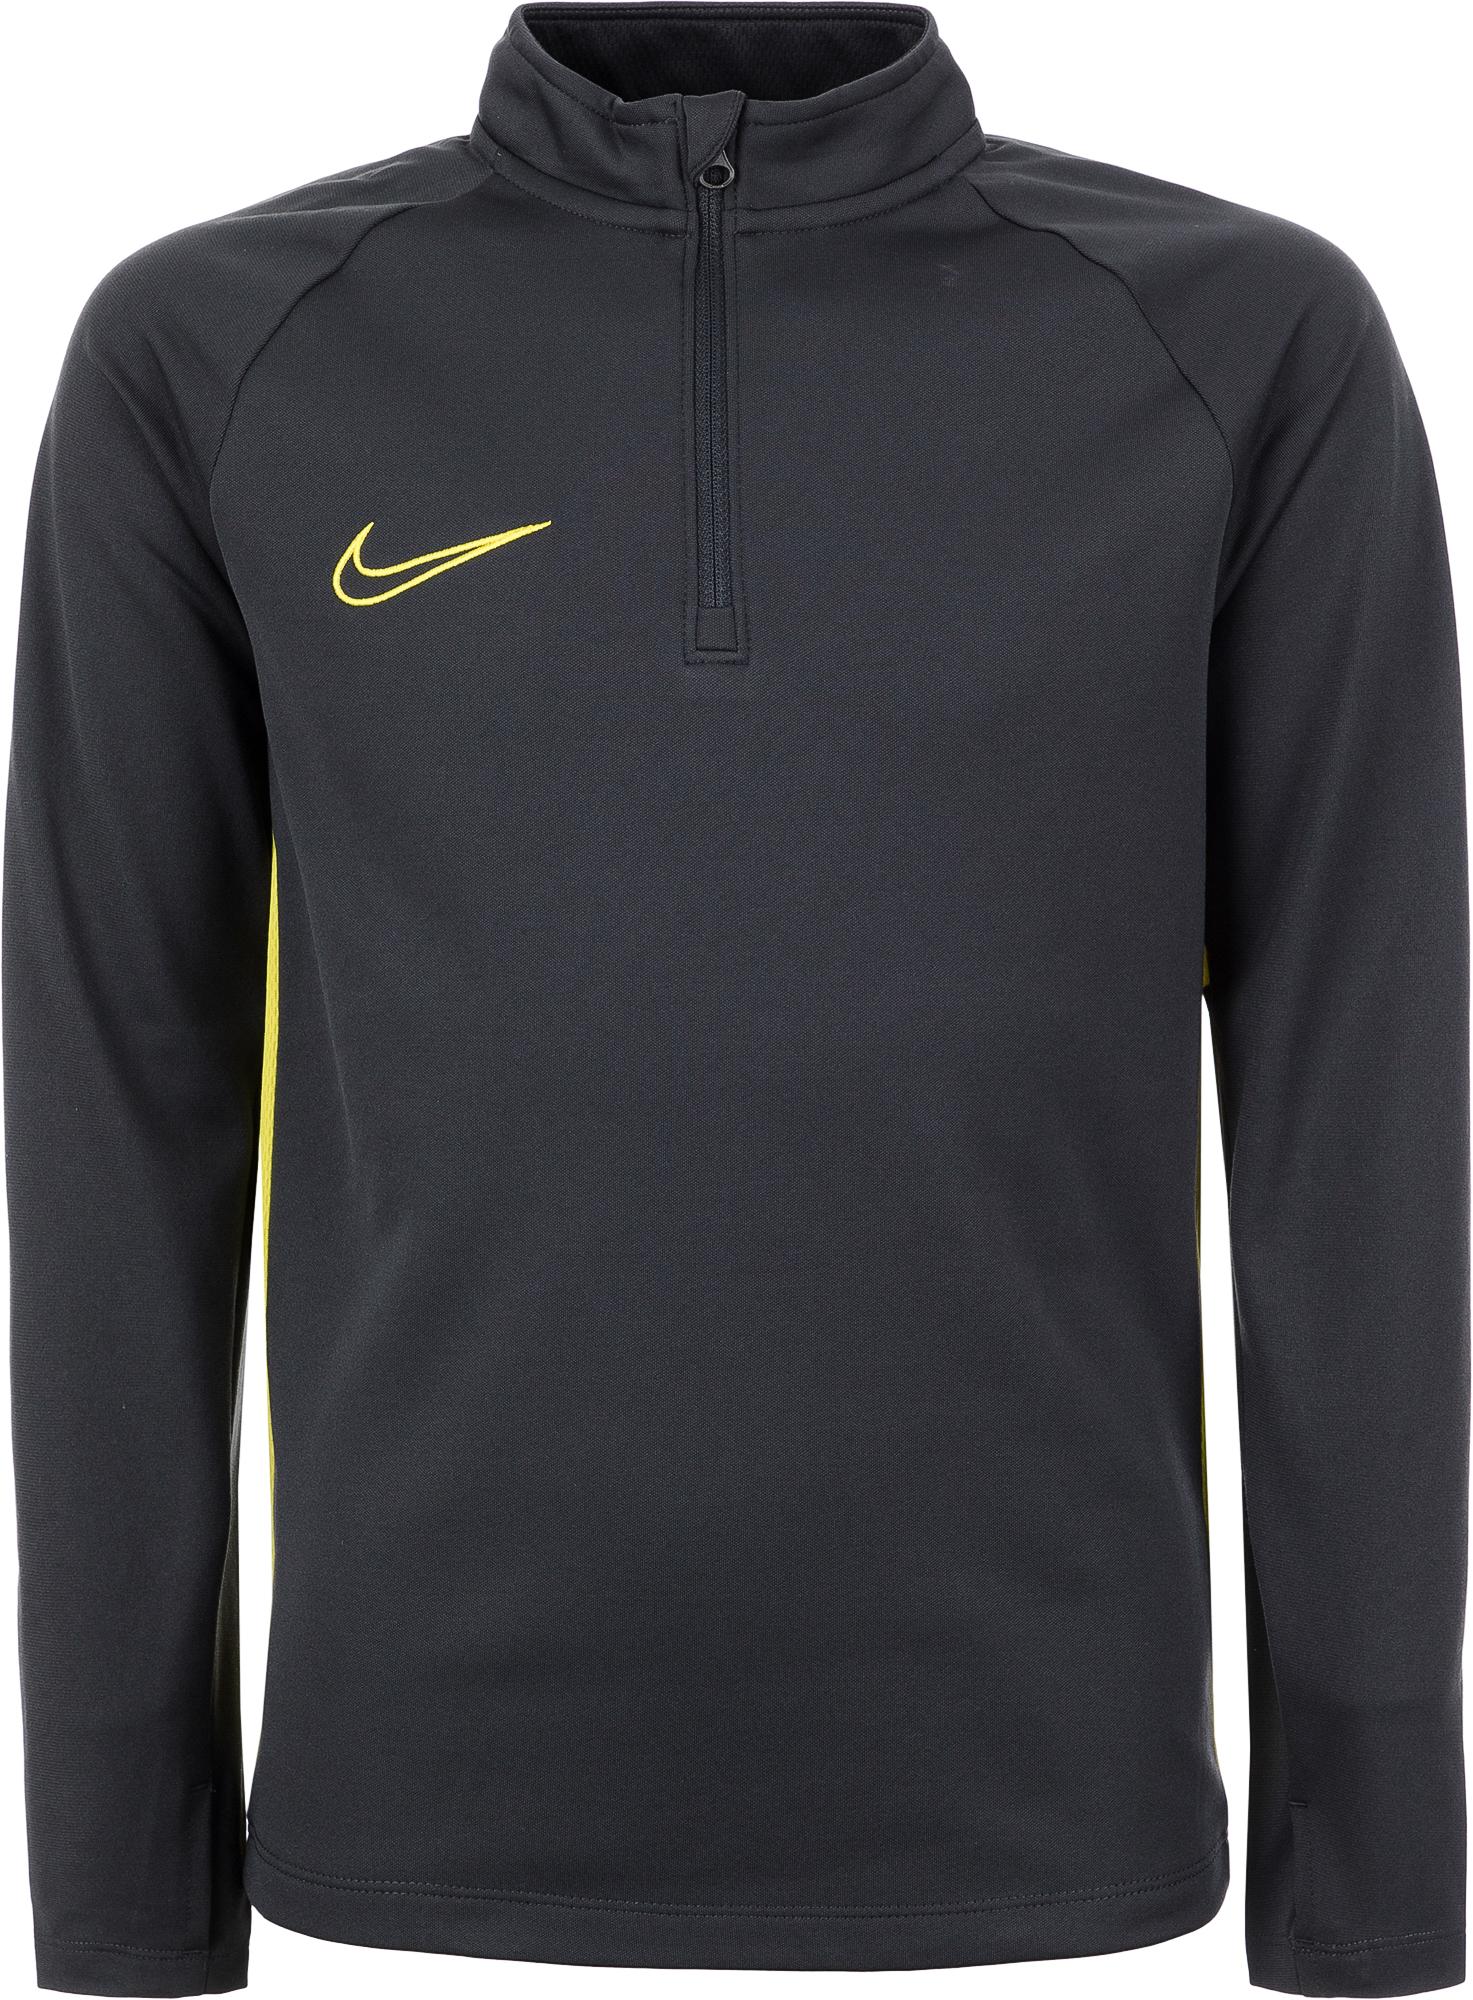 Nike Джемпер для мальчиков Nike Academy, размер 128-137